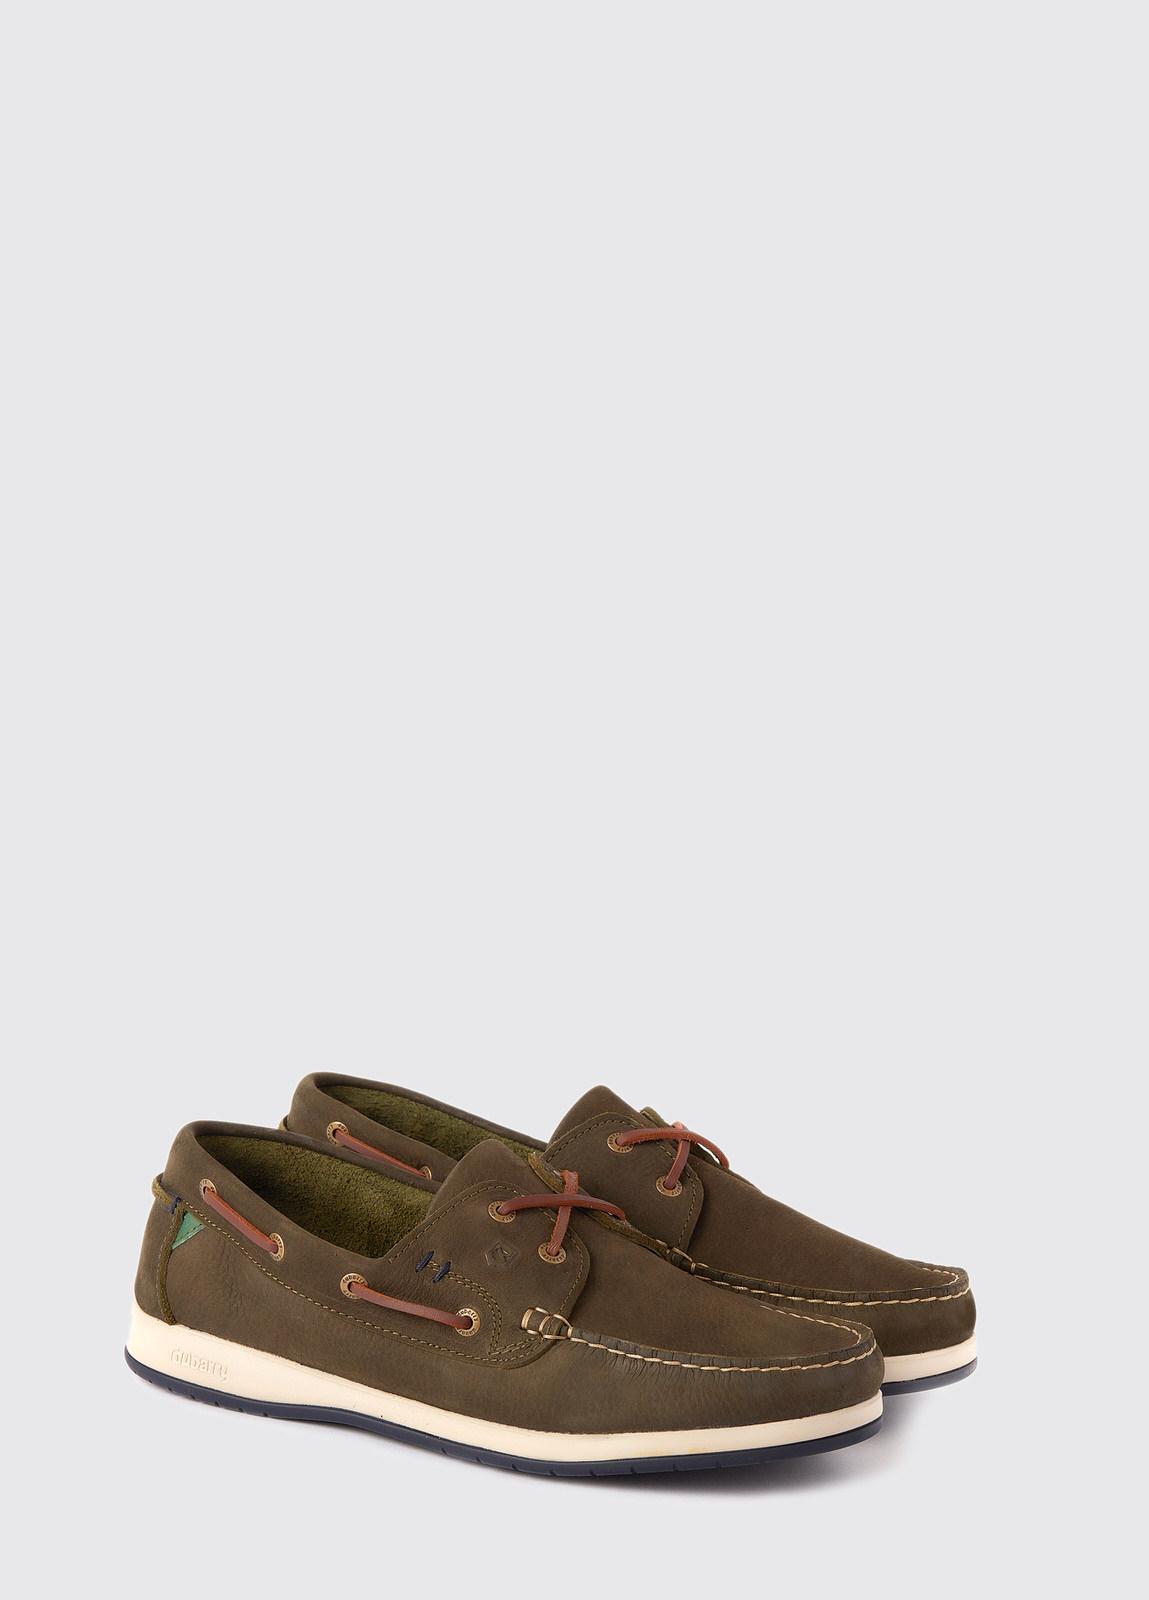 Armada X LT Deck shoes - Verdigris